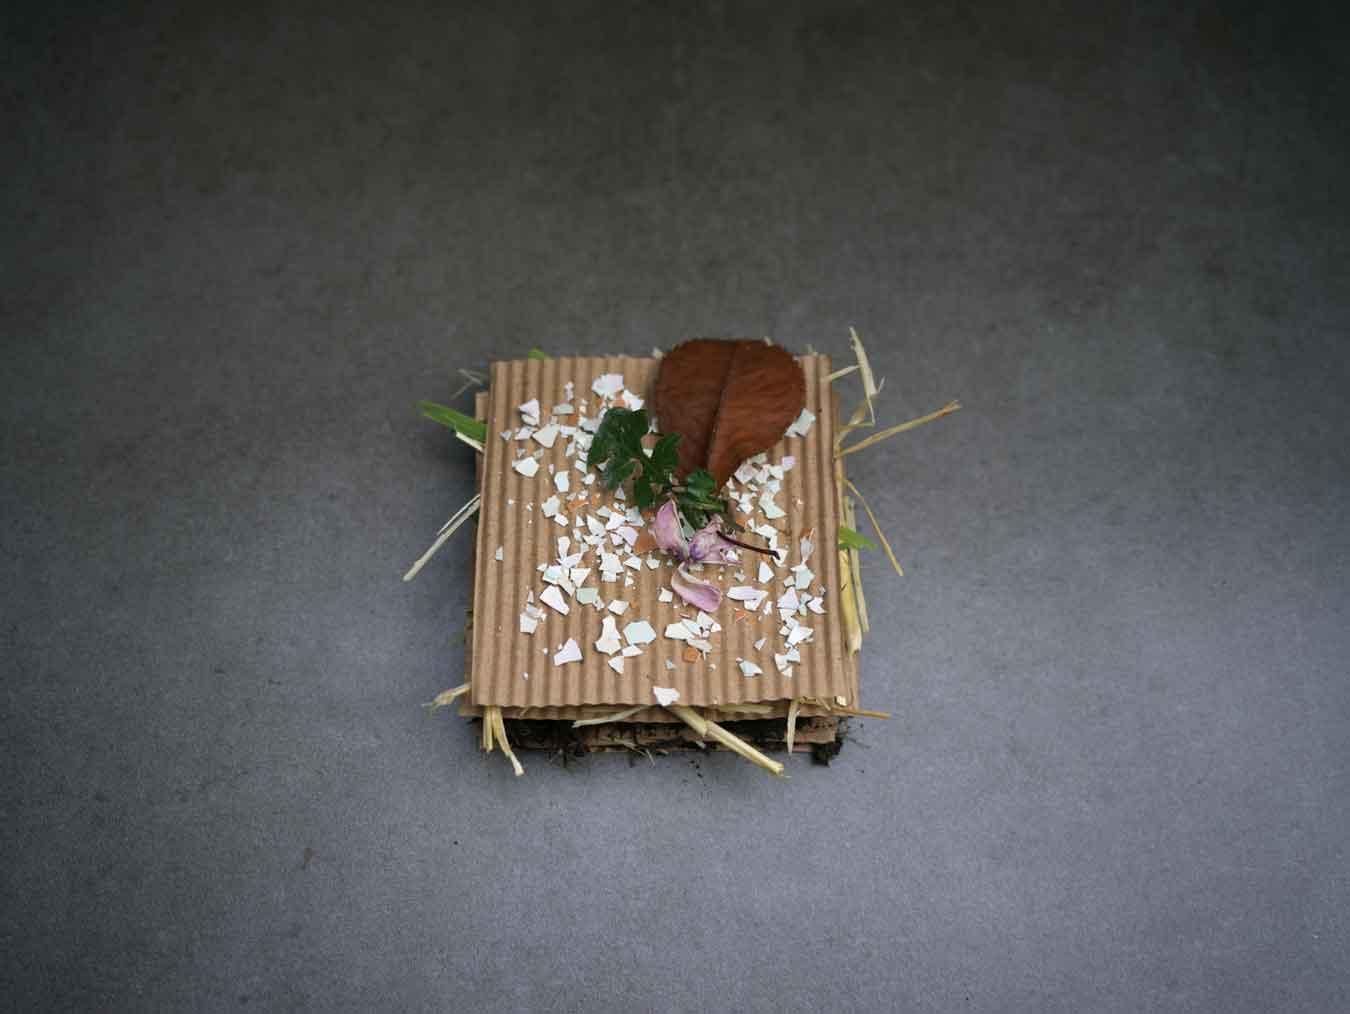 The-Poetic-of-Soil-Health_Luxiders-Magazine